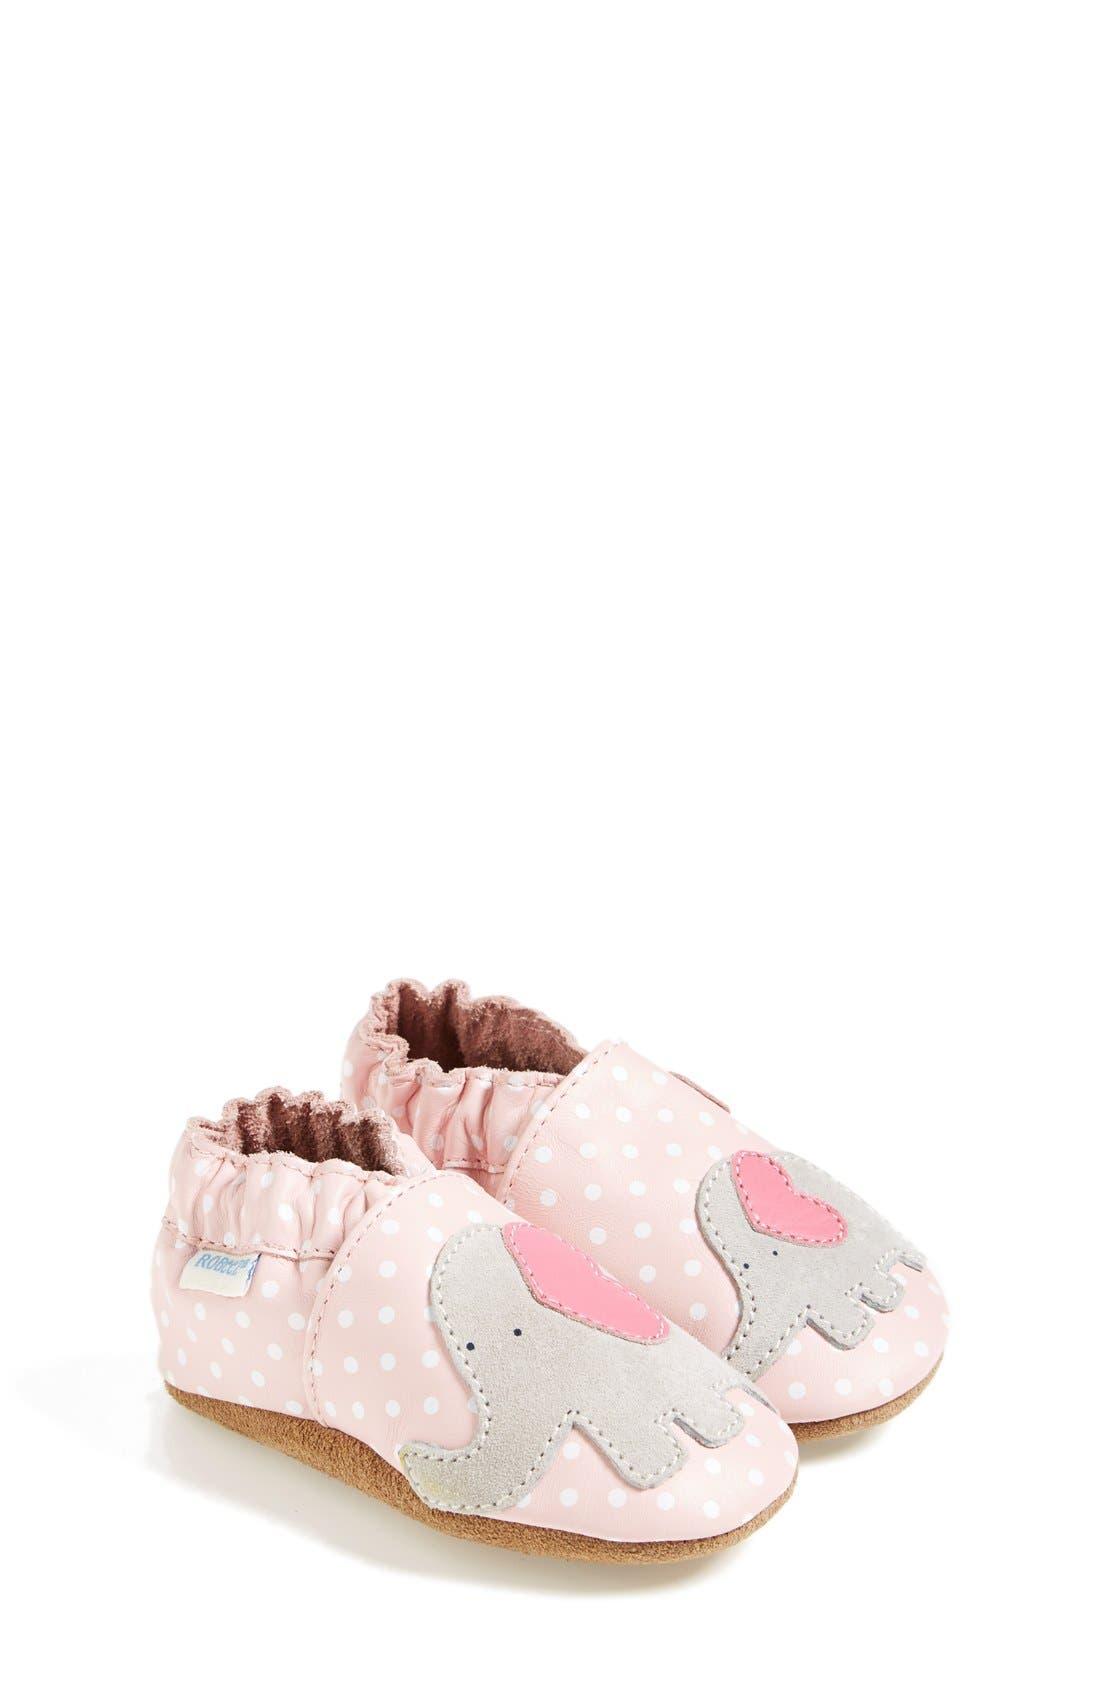 ROBEEZ® 'Little Peanut' Crib Shoe